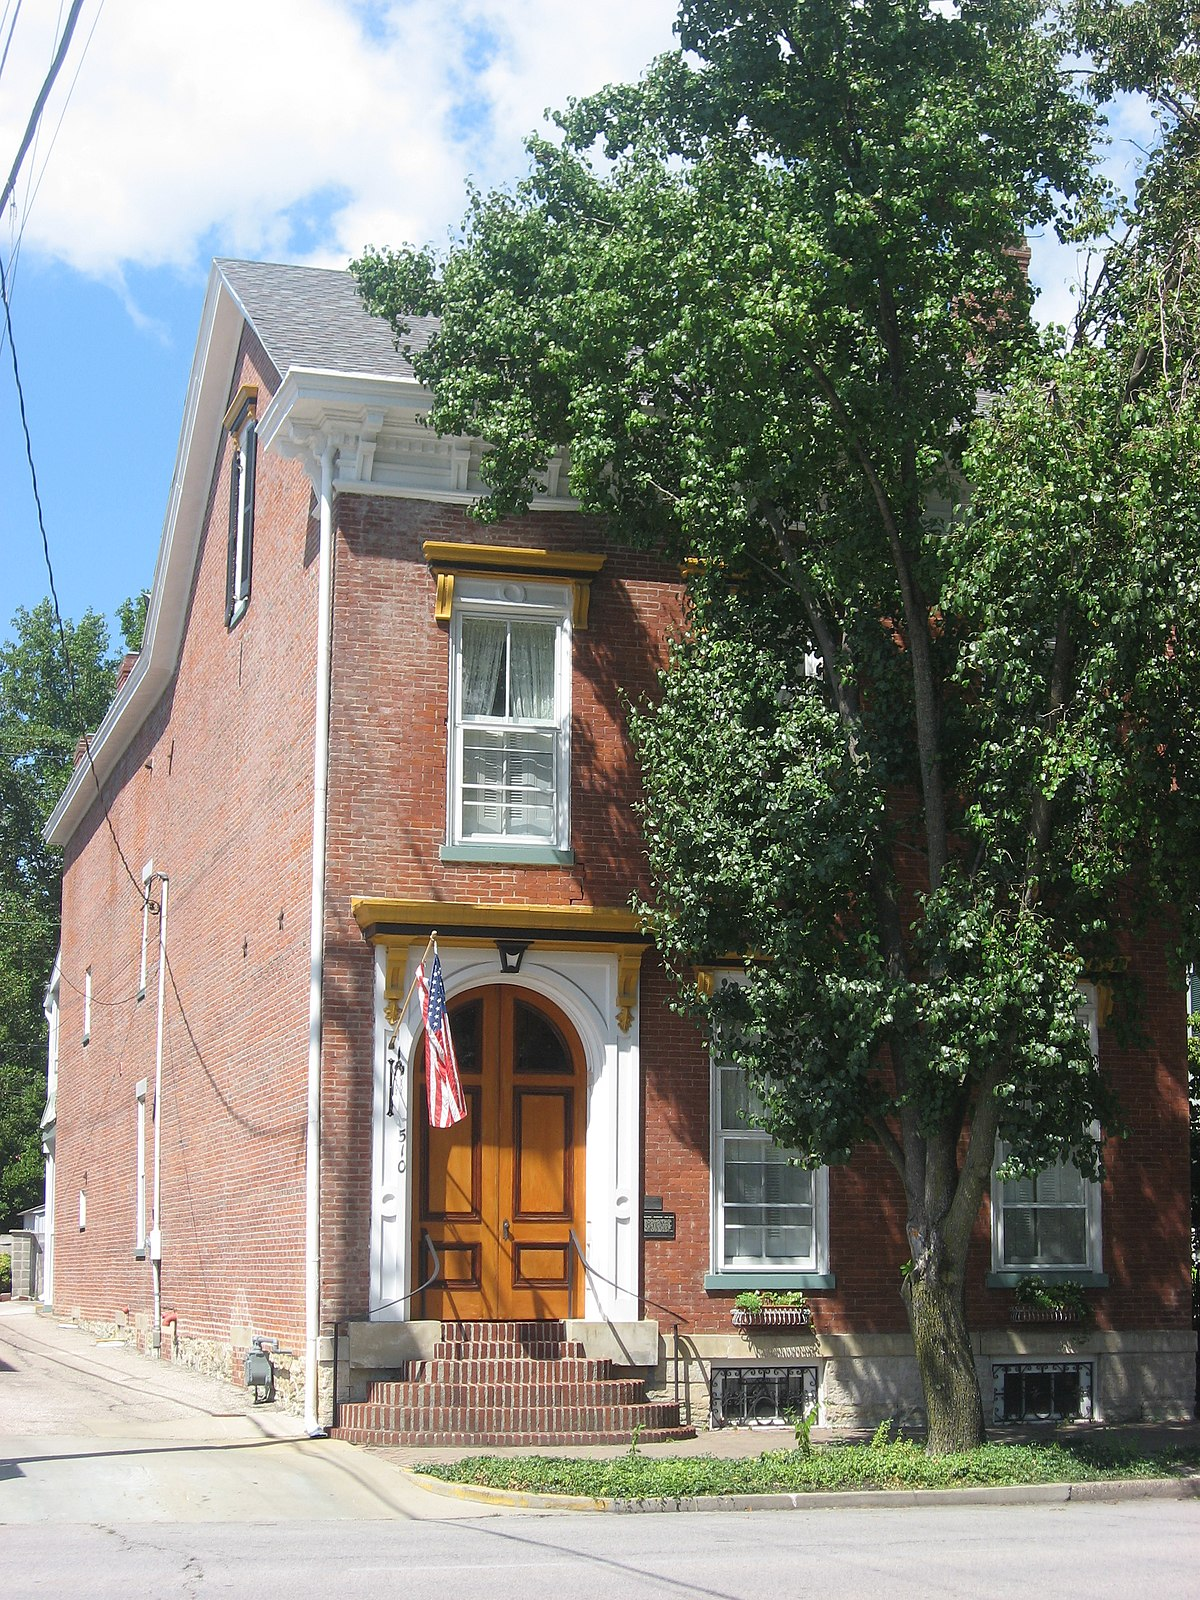 Crawford whitehead ross house wikipedia for Crawford house